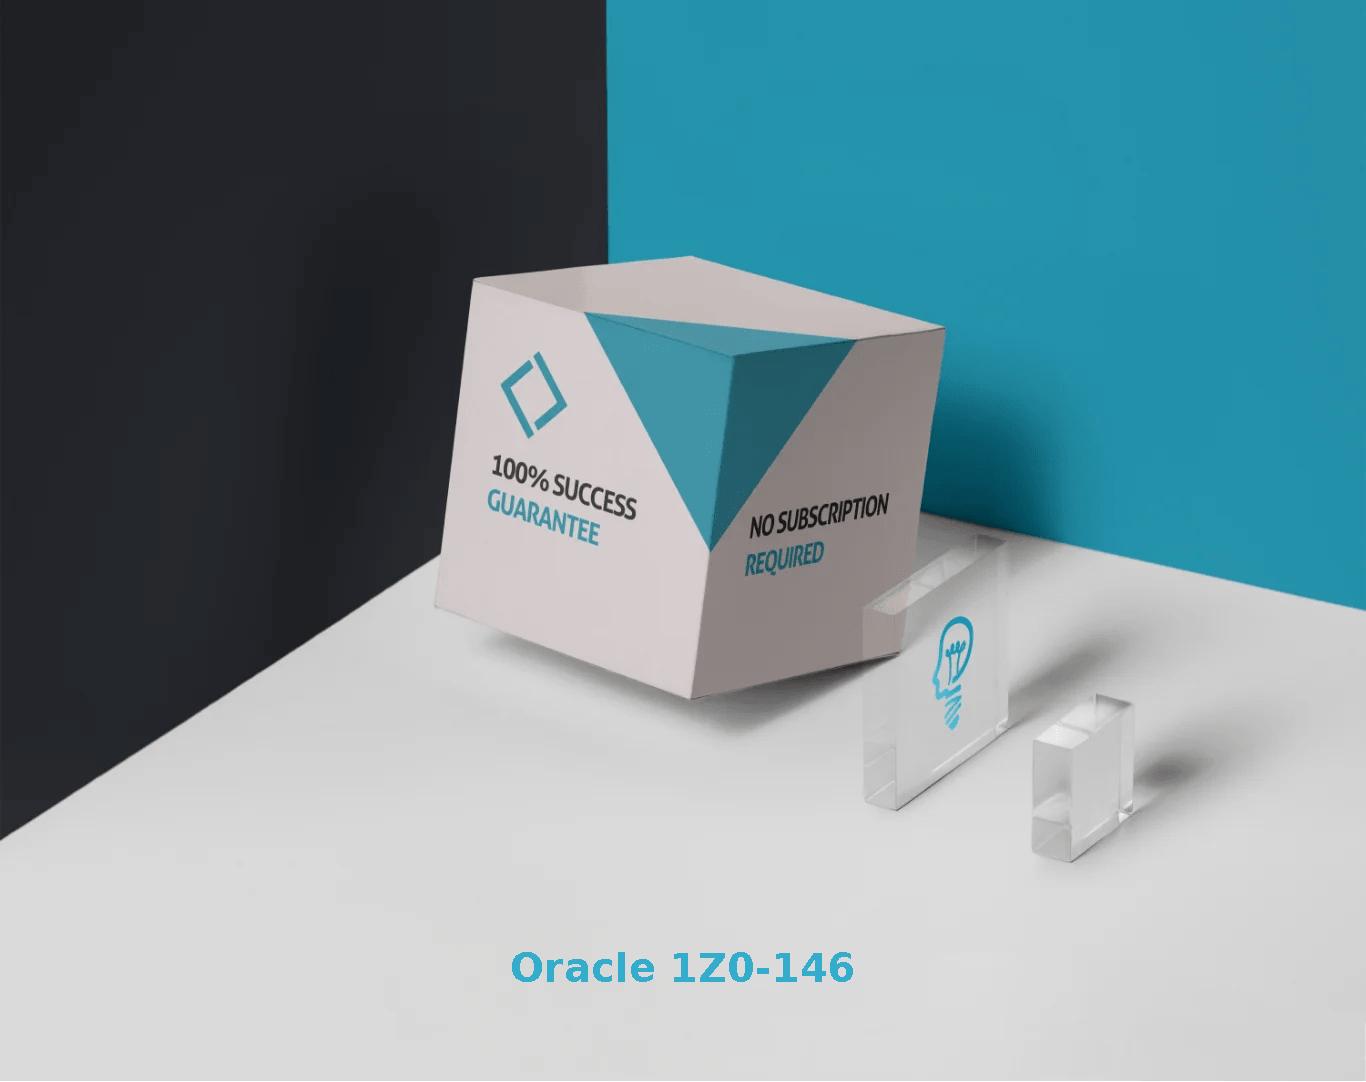 Oracle 1Z0-146 Exams